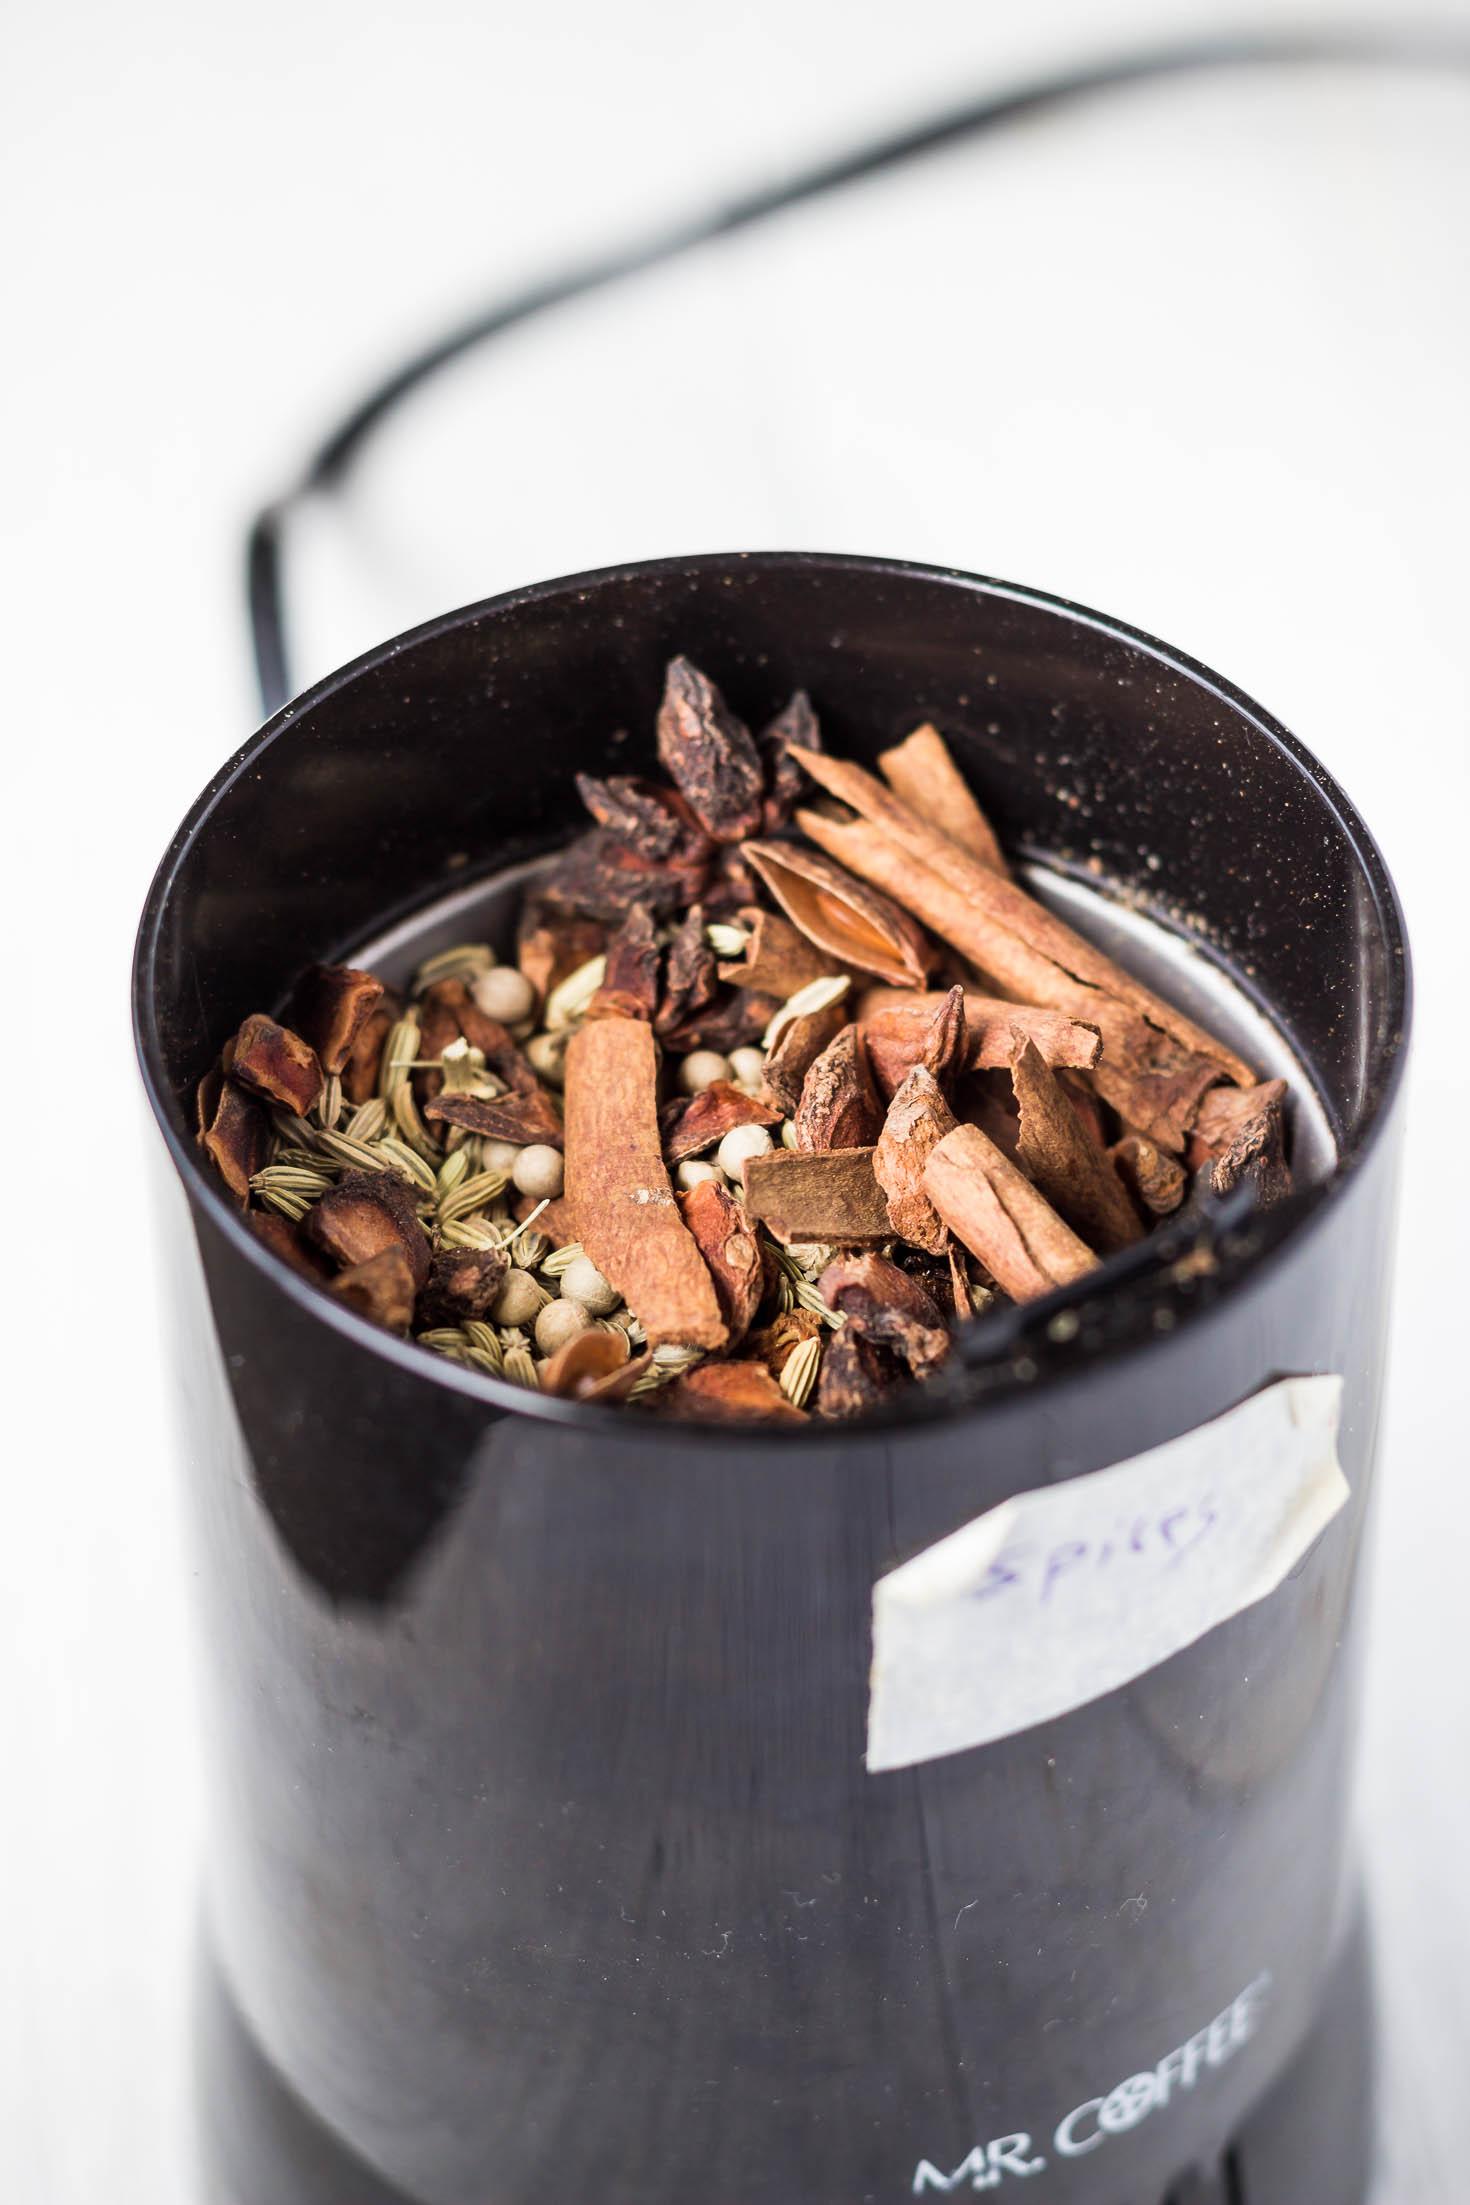 Chinese 5-Spice Powder-ingredients in coffee grinder